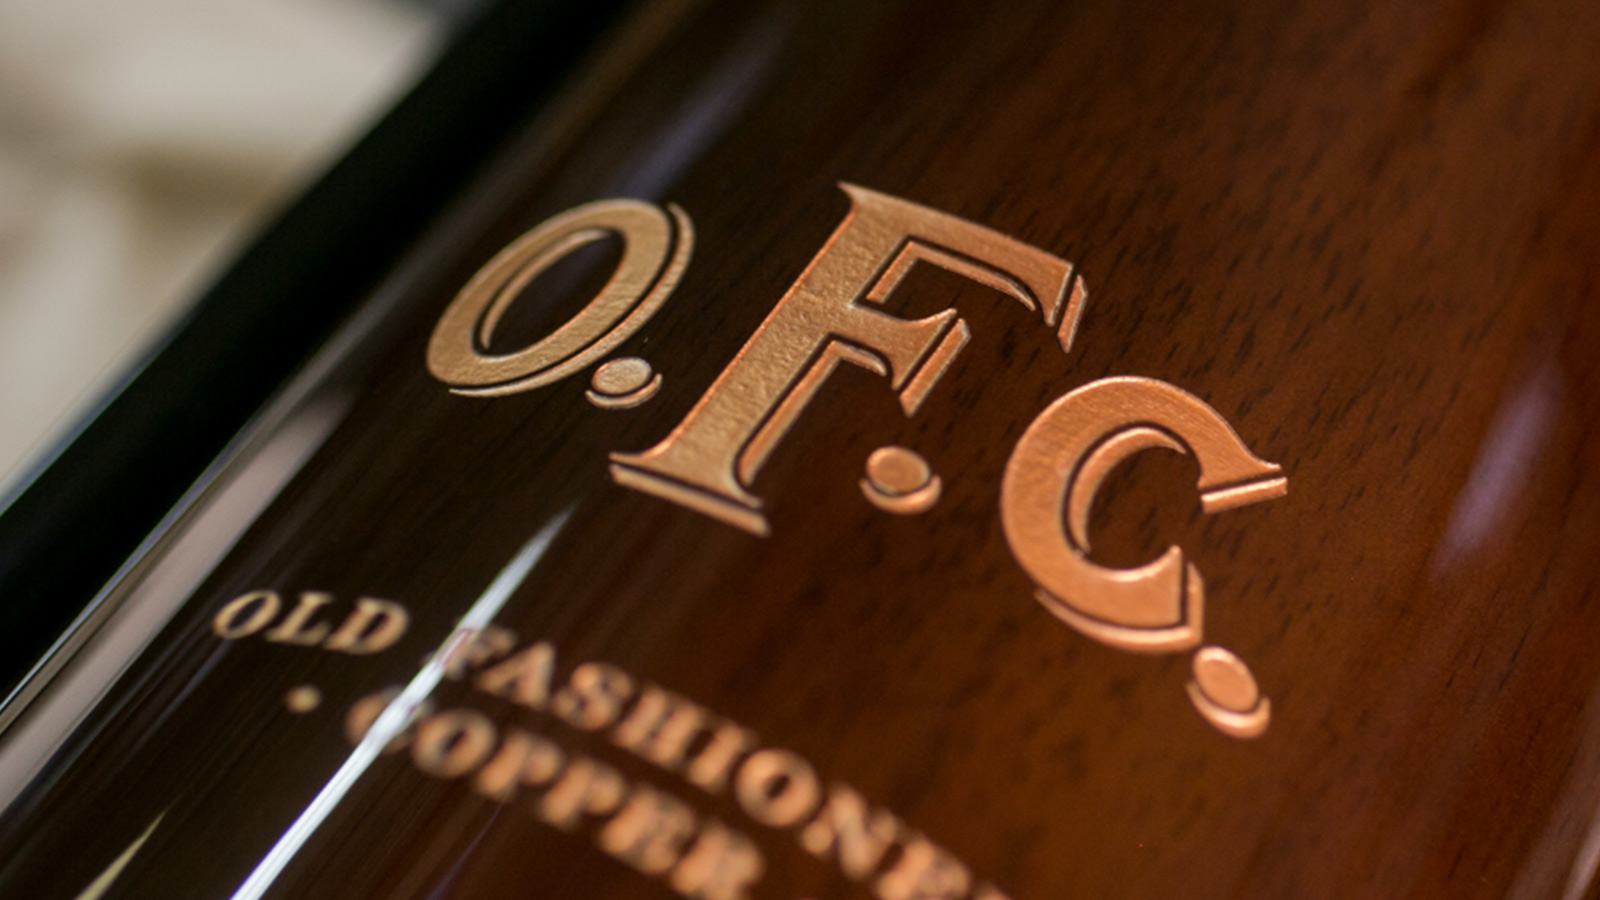 Buffalo Trace 1994 vintage O.F.C. Bourbon Whiskey